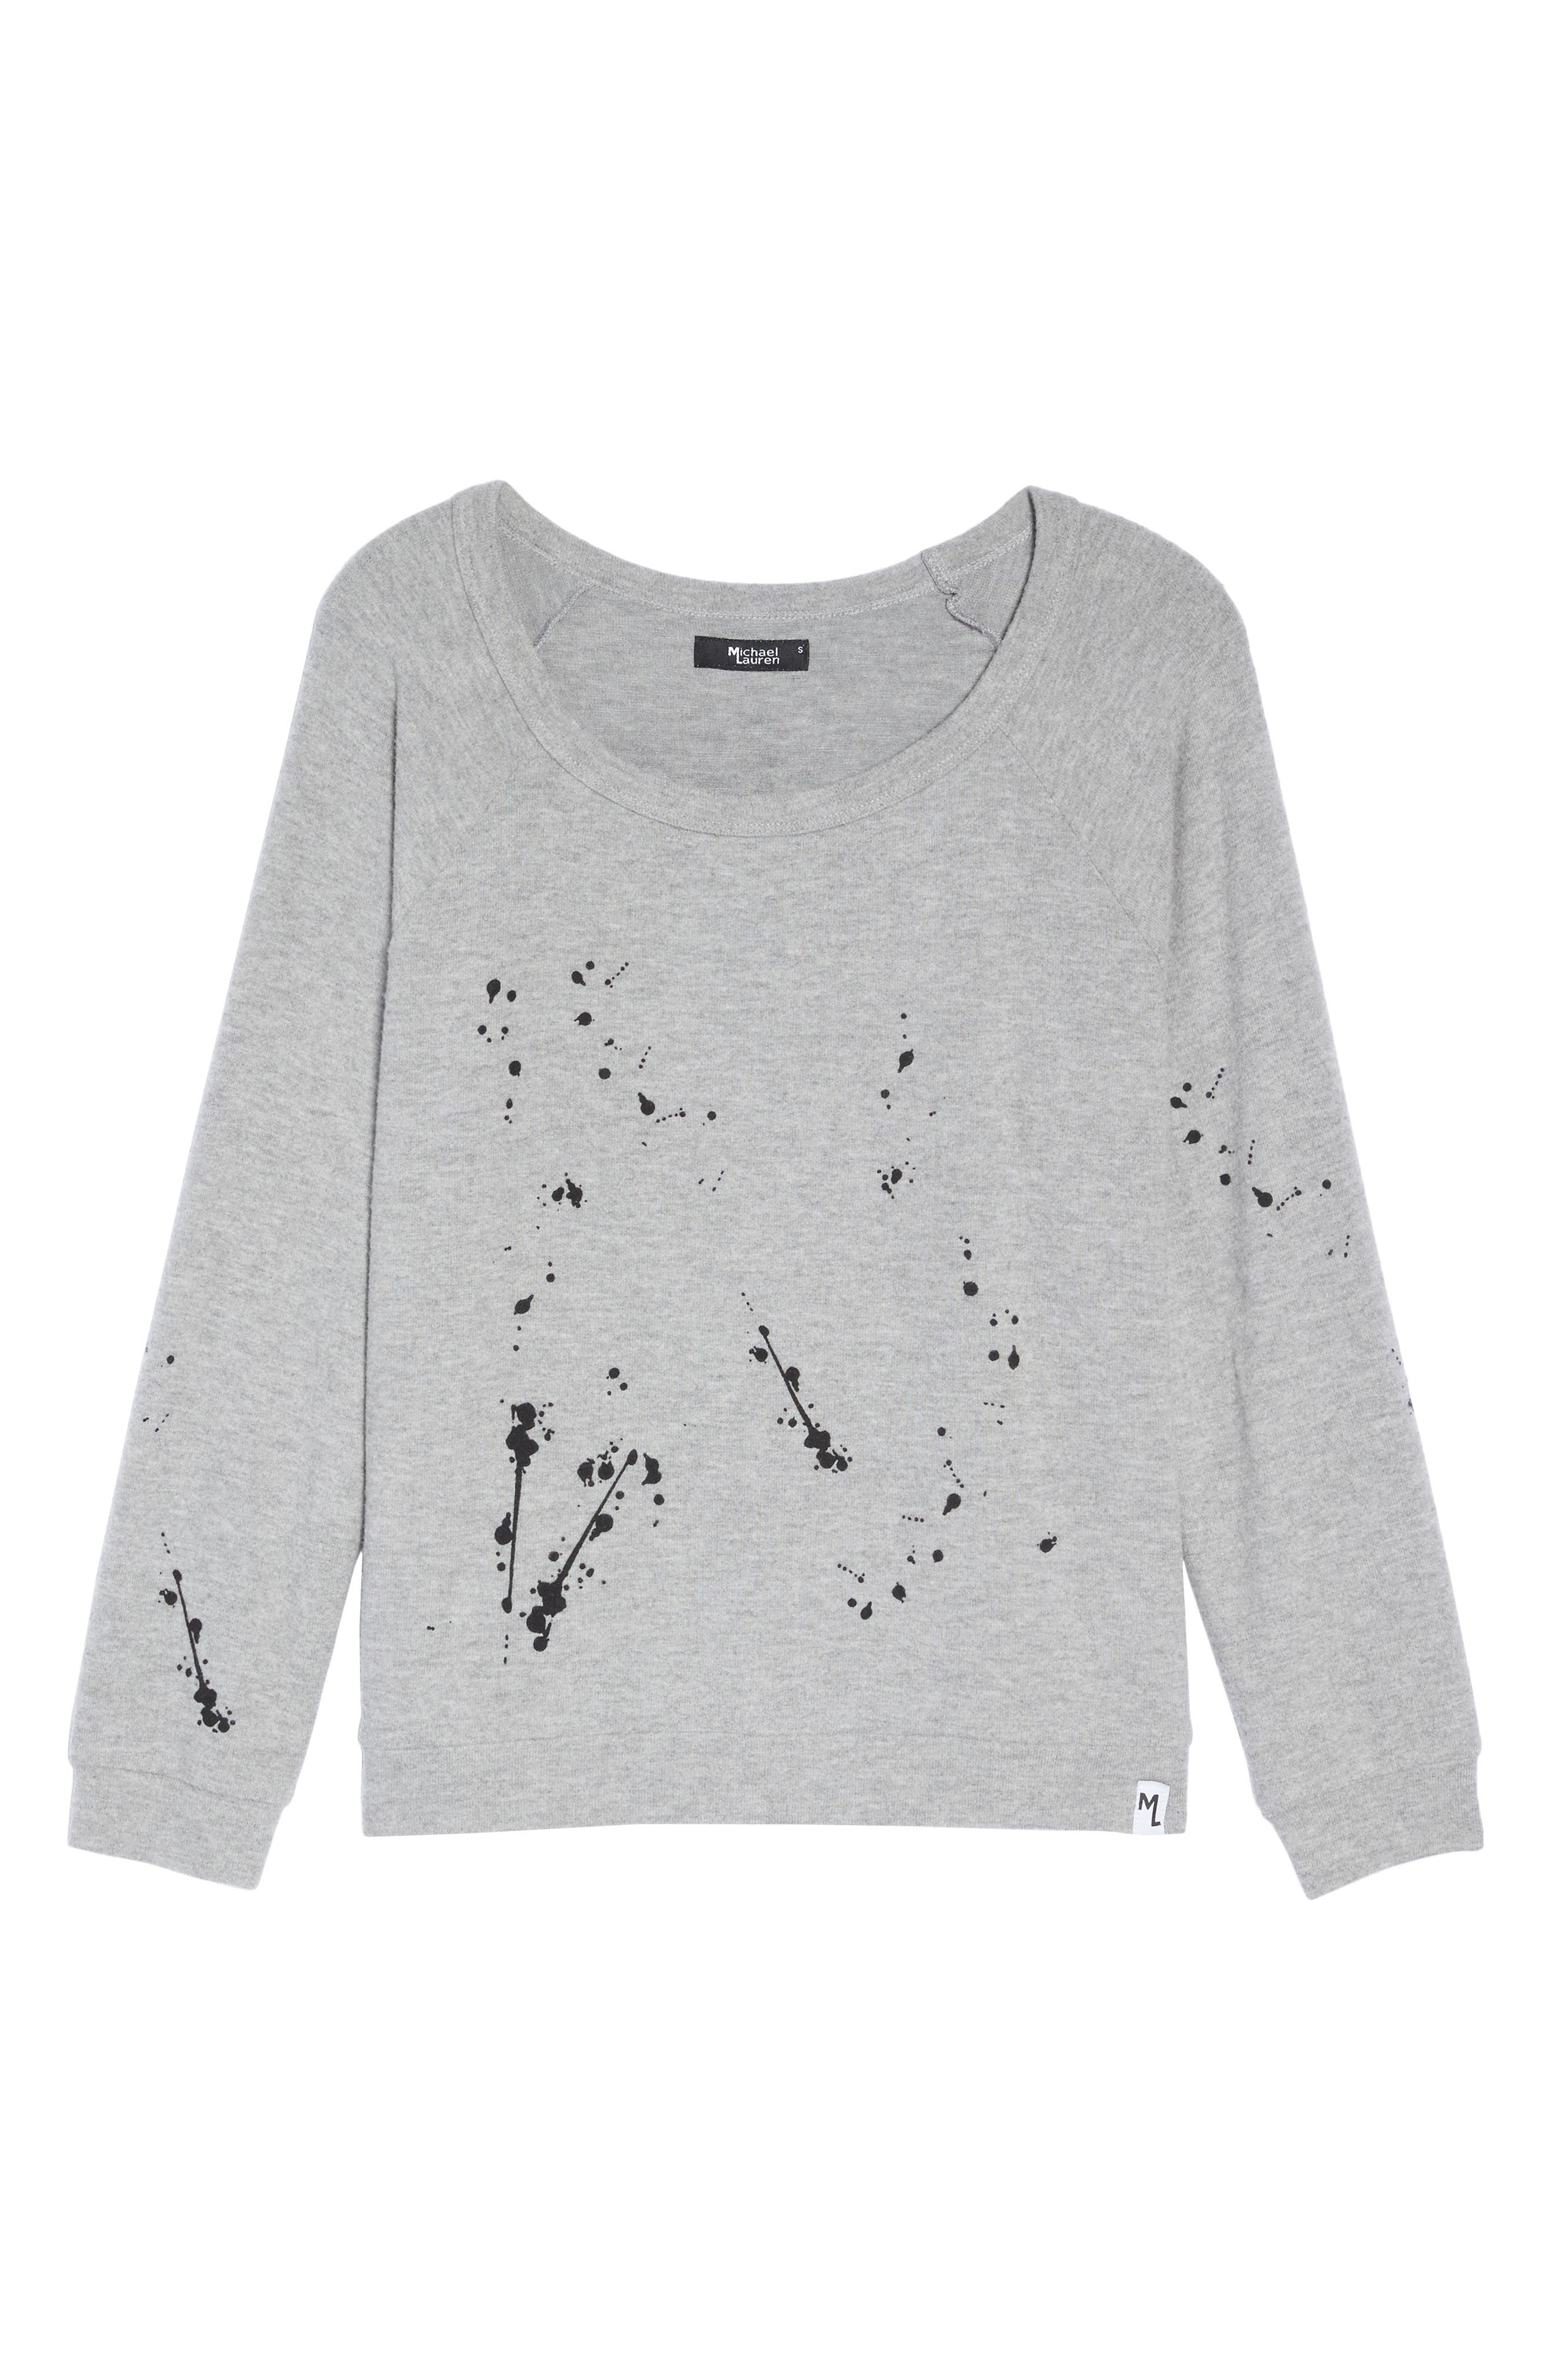 Kenny Splatter Lounge Sweatshirt,                             Alternate thumbnail 6, color,                             035